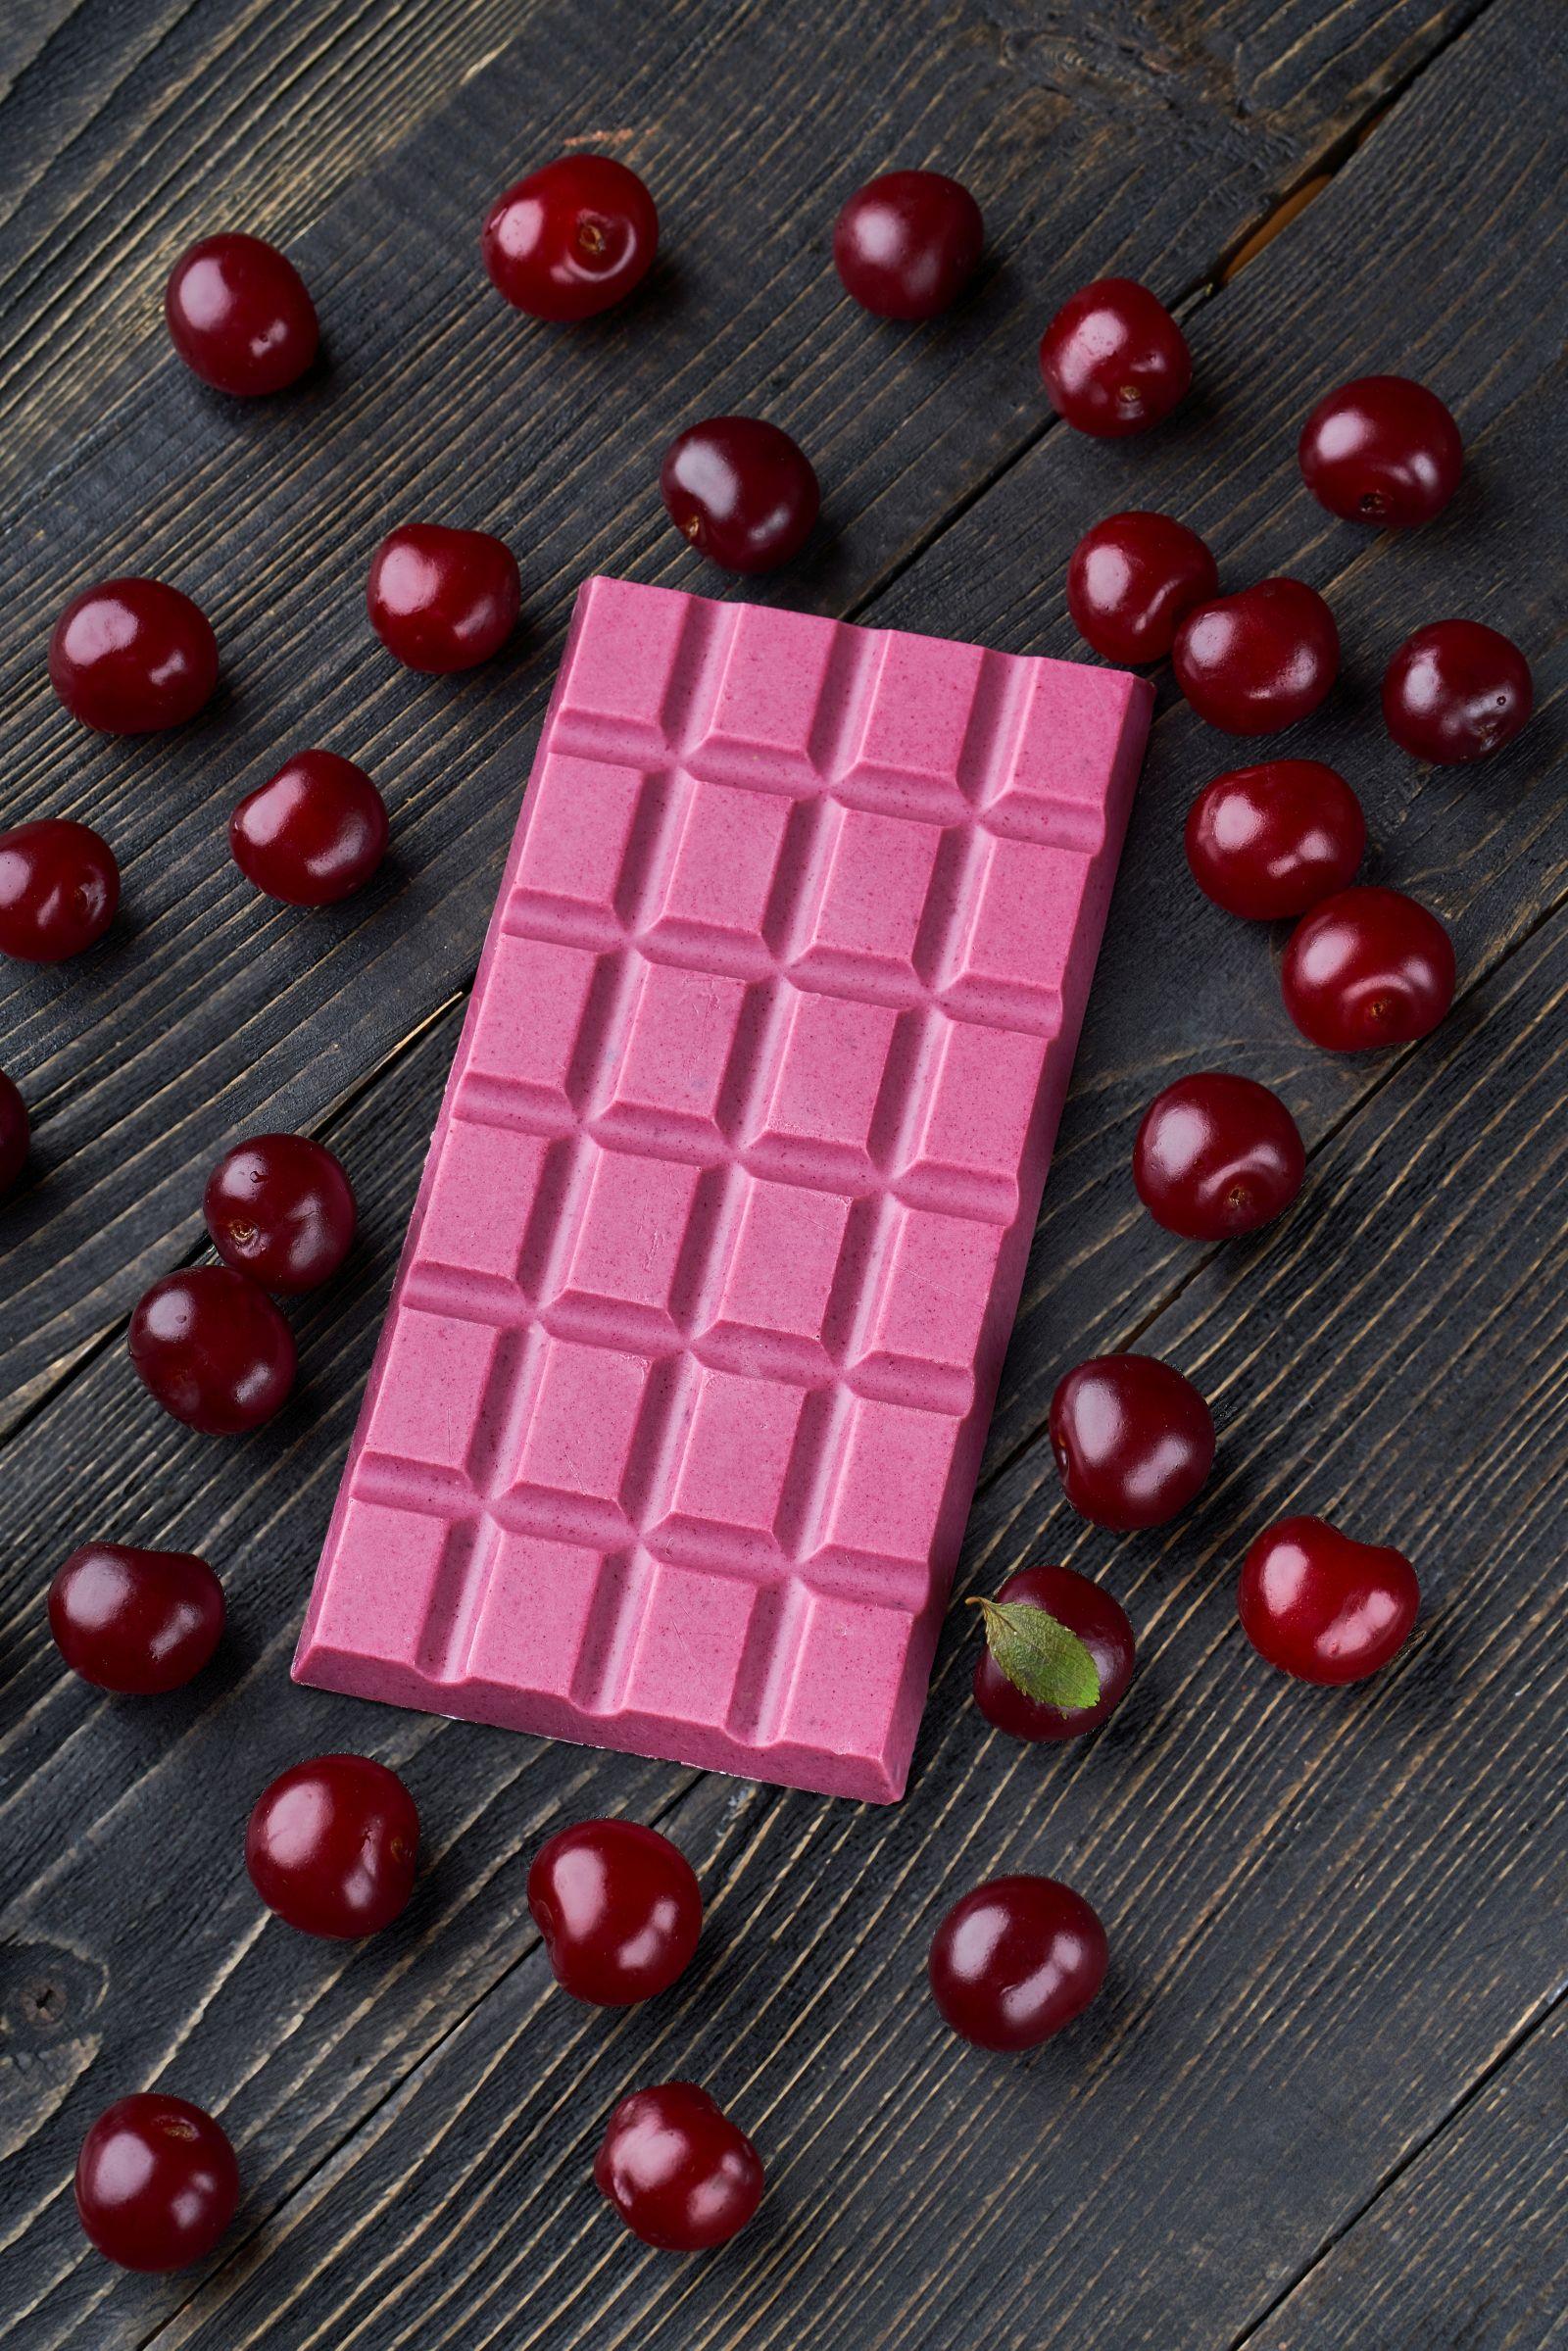 Шоколадки с фото на заказ дешево москва снимках фотографа